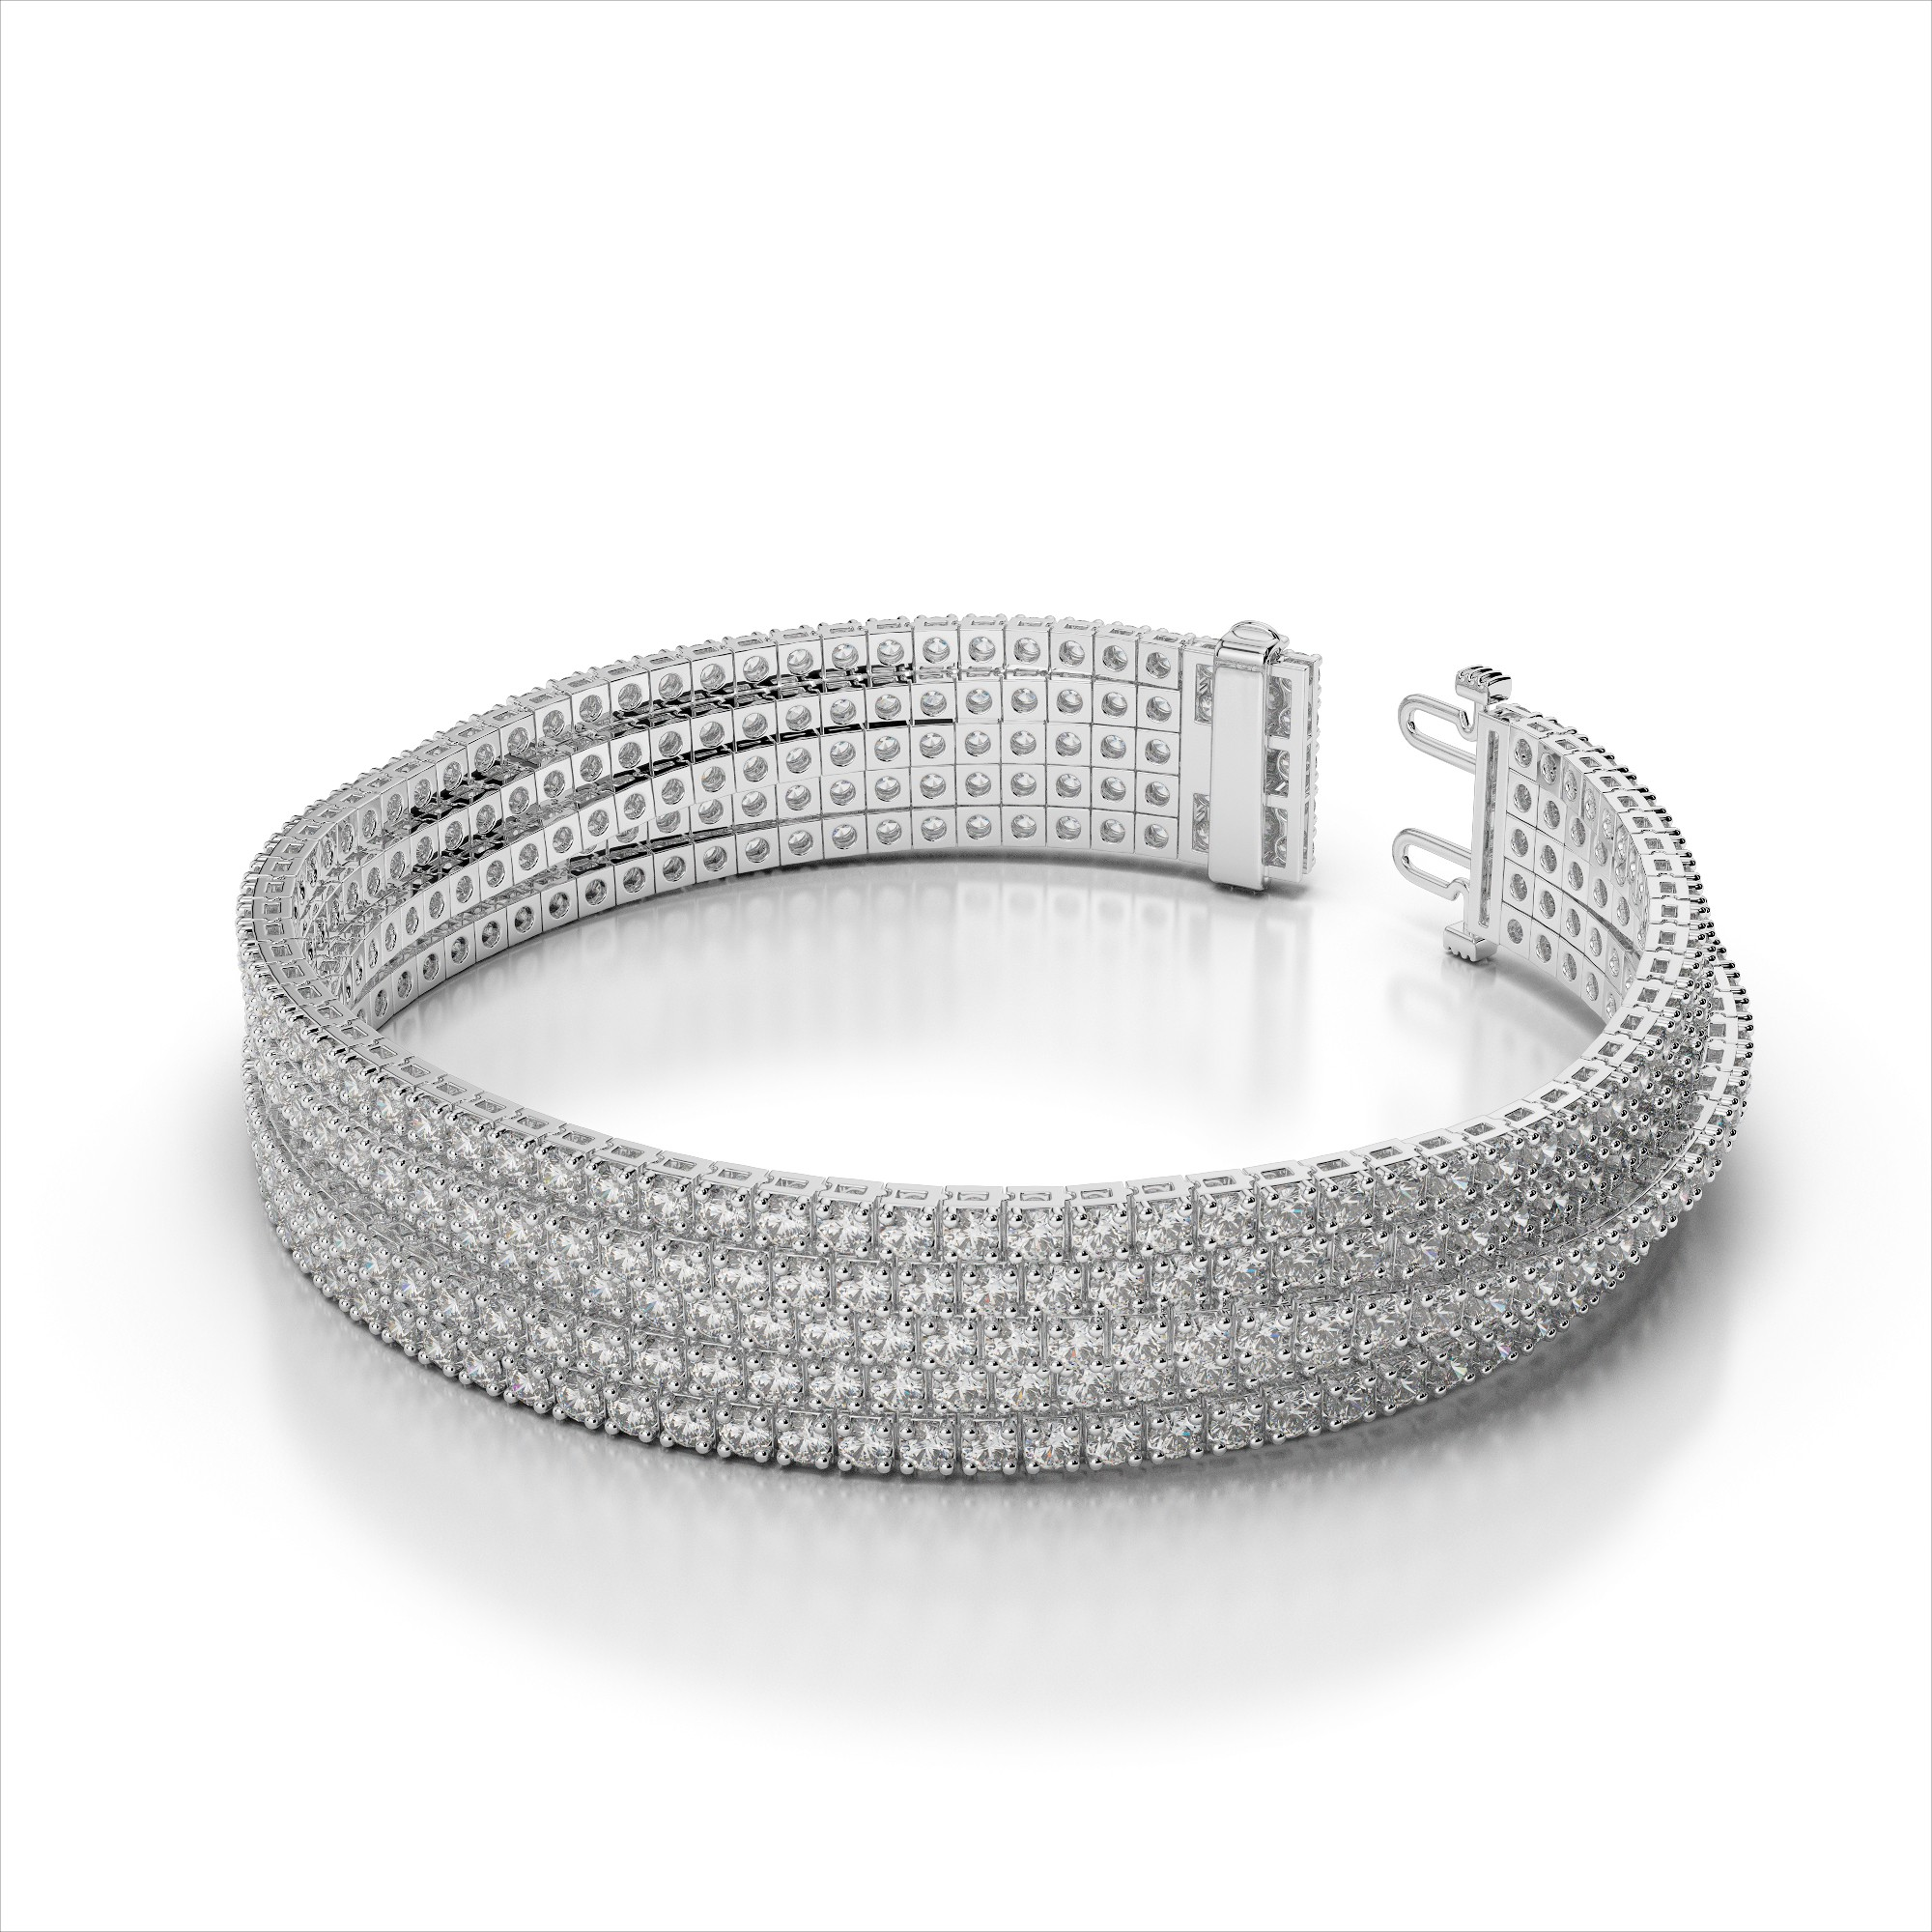 Five Strand Flexible Diamond Tennis Bracelet